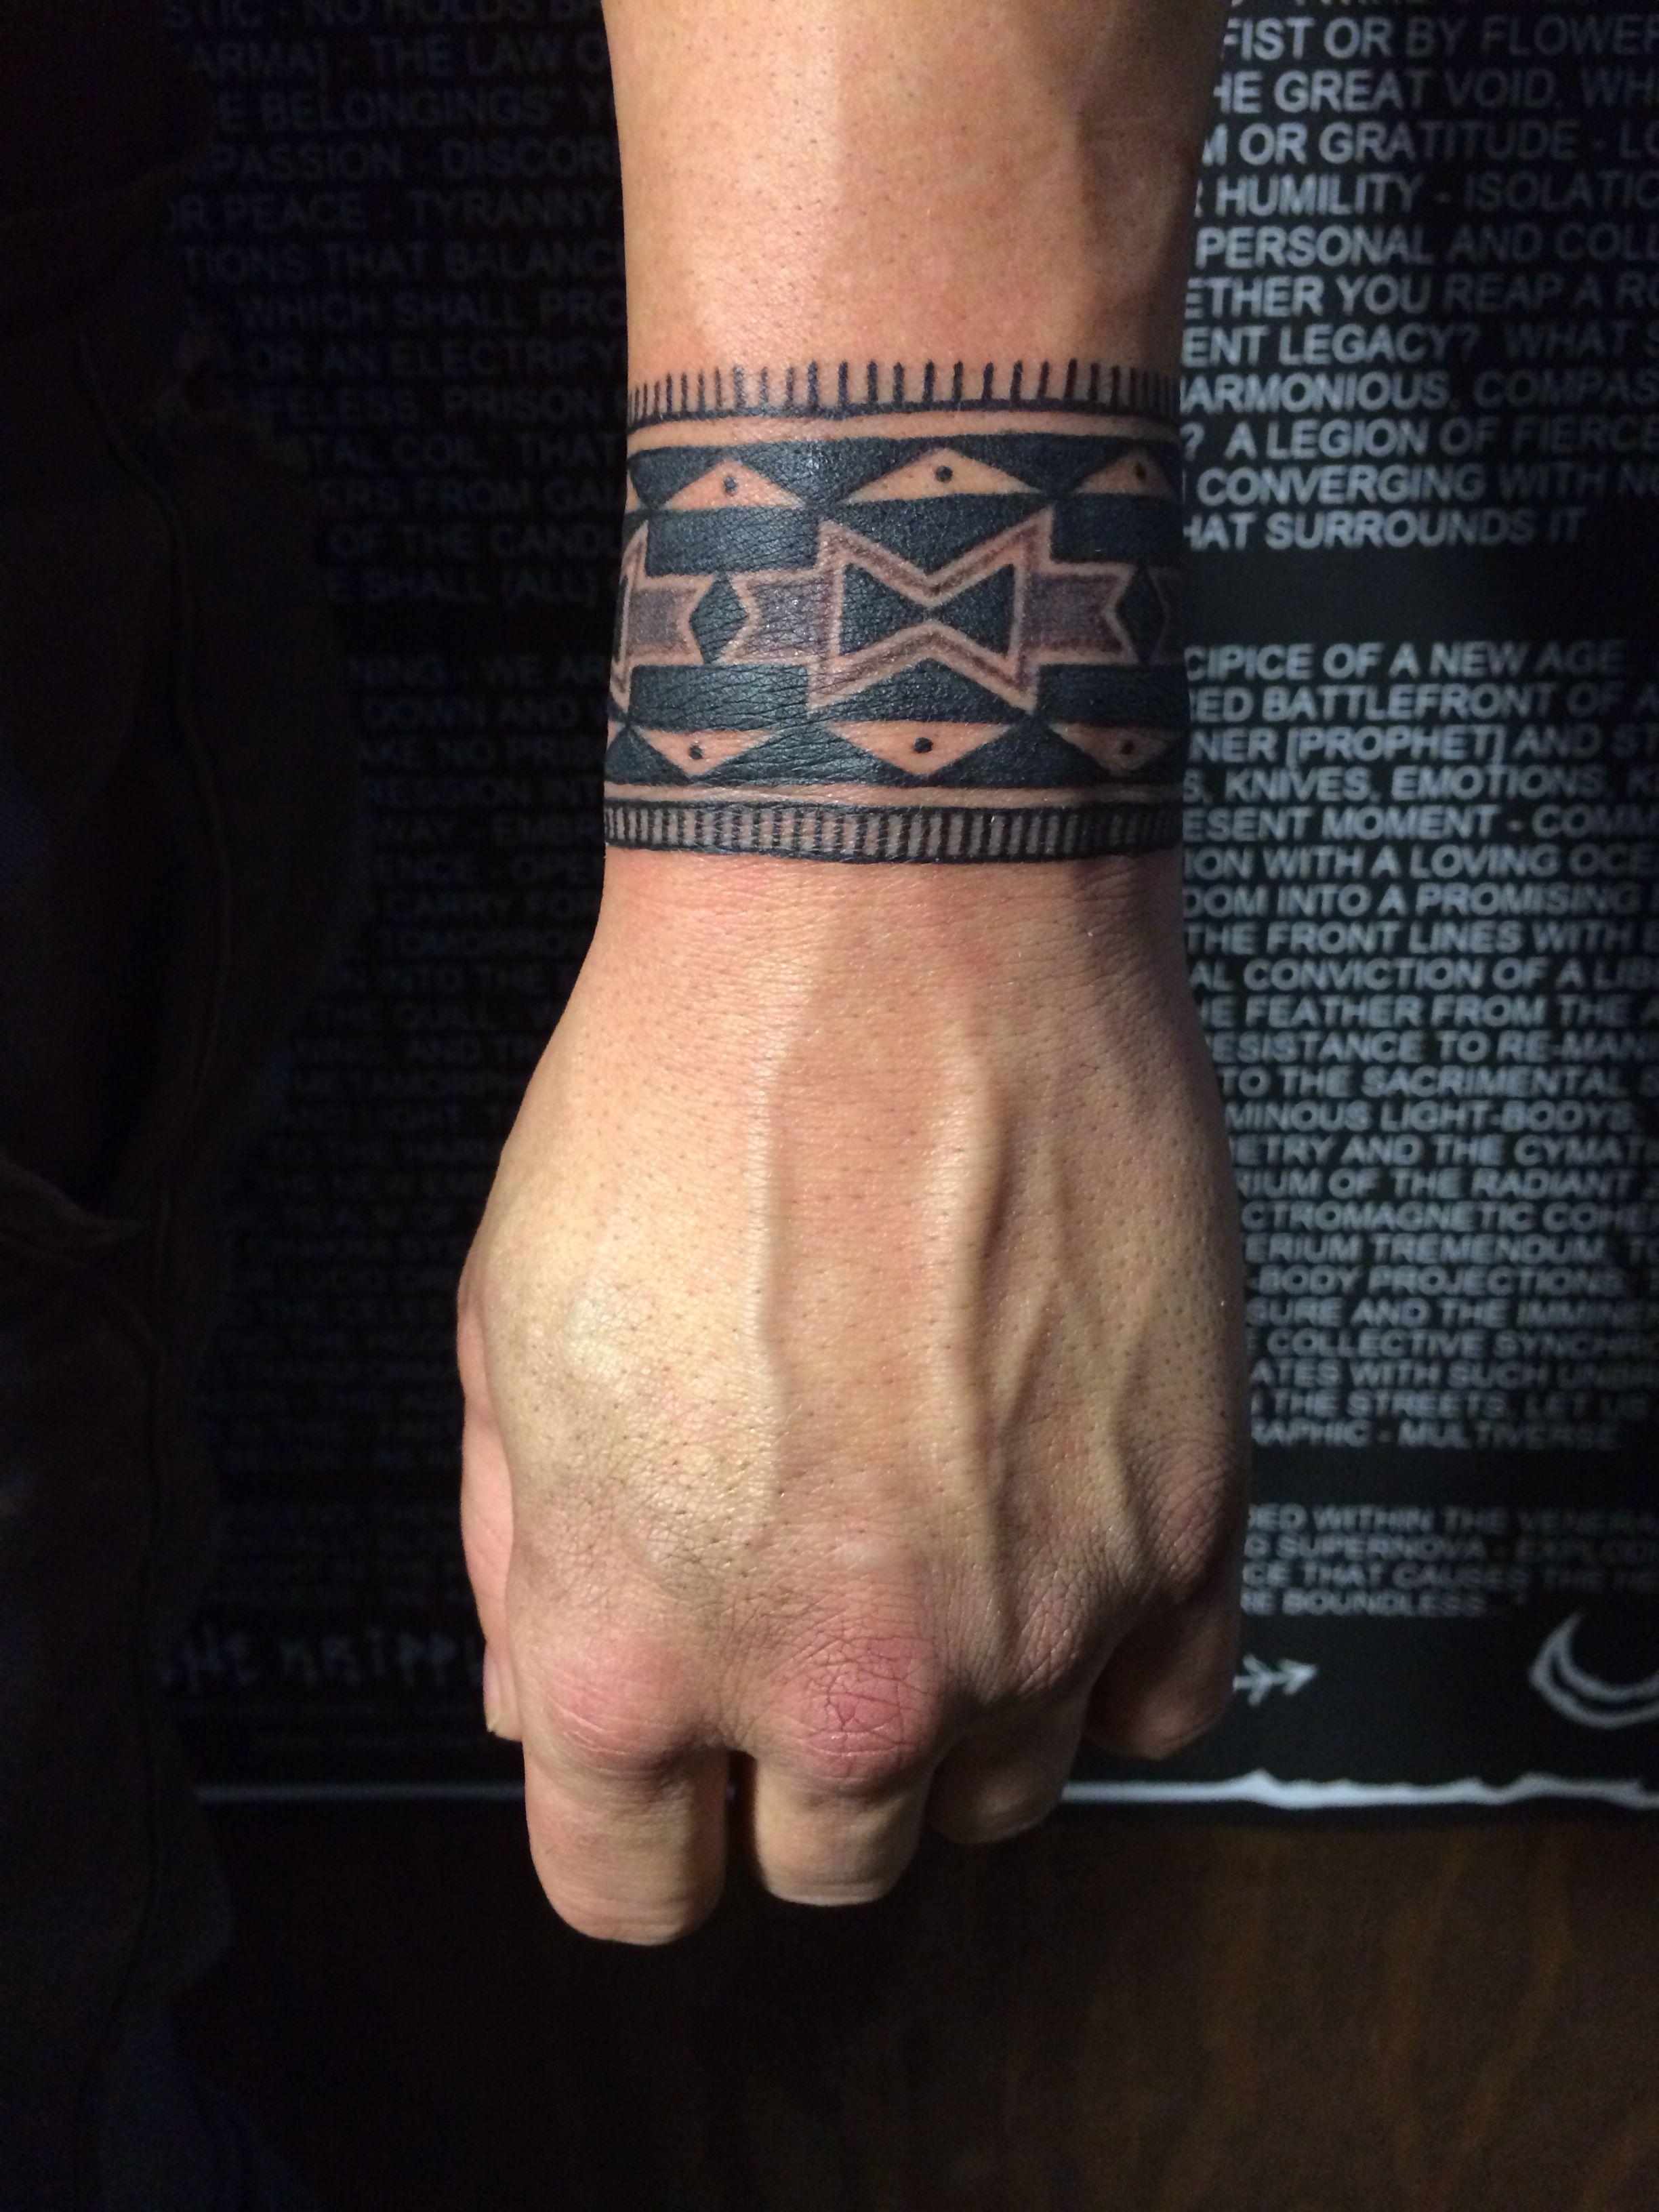 Watson Atkinson Twine Street Tattoo Native American Cuff Bday Present For My Boyfriend The End Cap Wrist Tattoos For Guys American Tattoos Tattoos For Guys